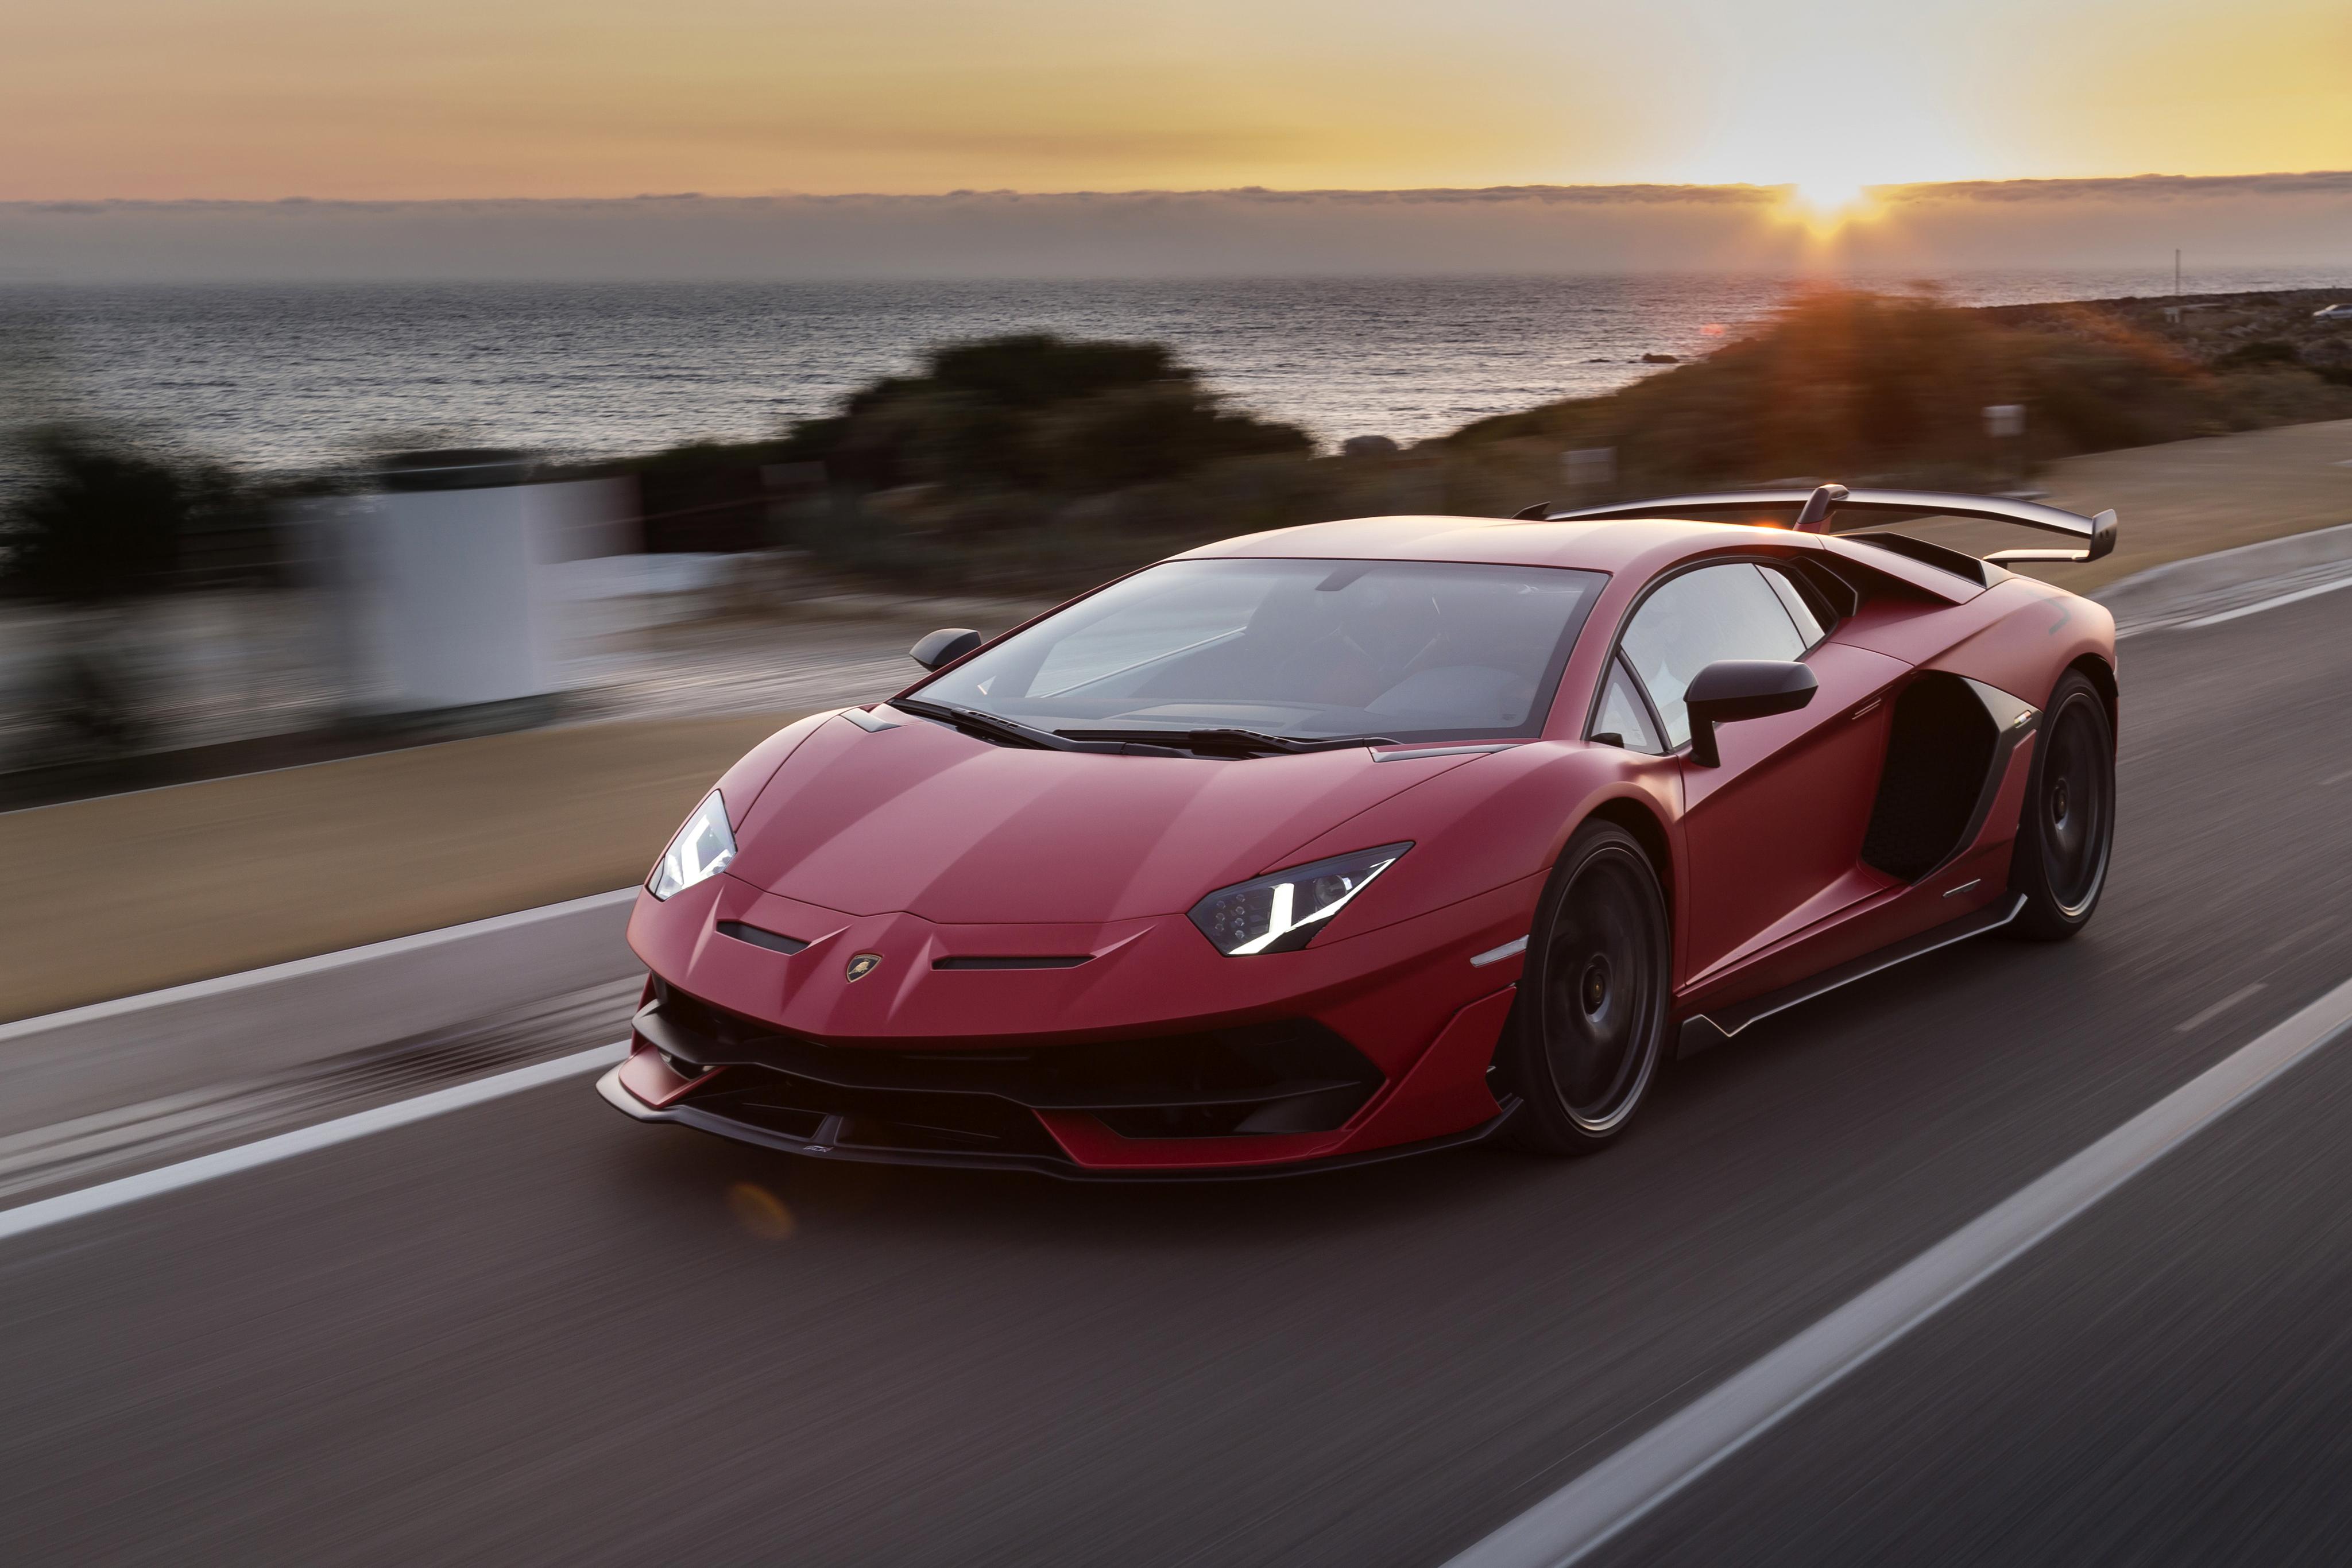 Lamborghini Aventador Svj 4k Ultra Hd Wallpaper Background Image